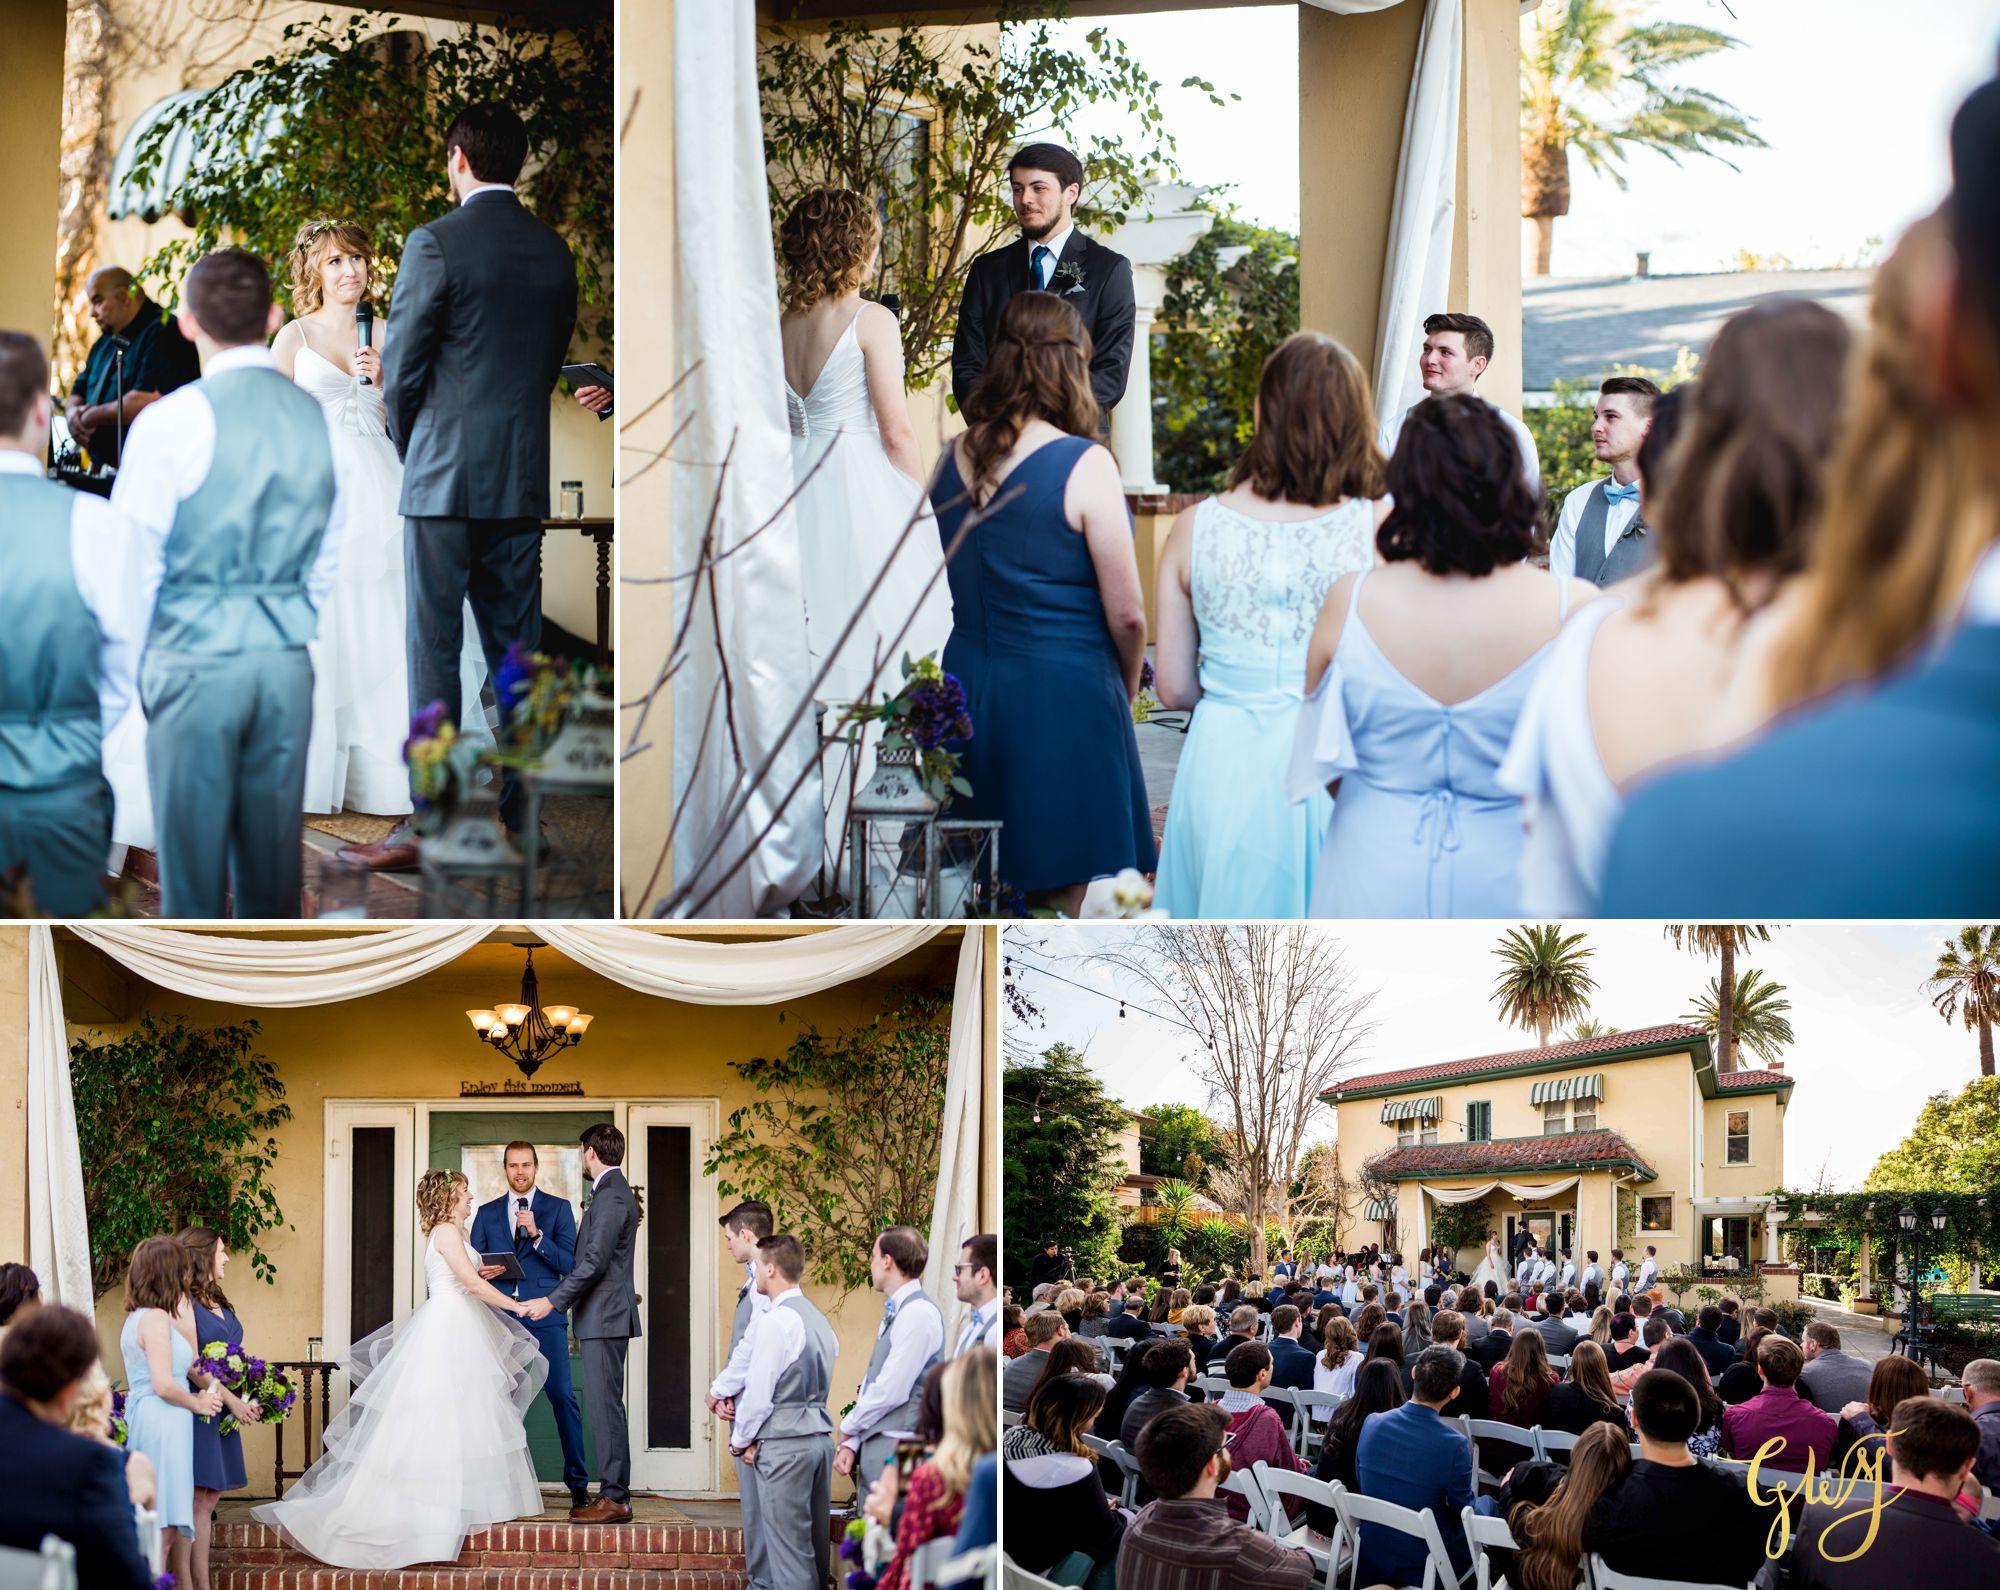 Garrett + Michelle's French Estate Orange County Spring Wedding by Glass Woods Media 25.jpg